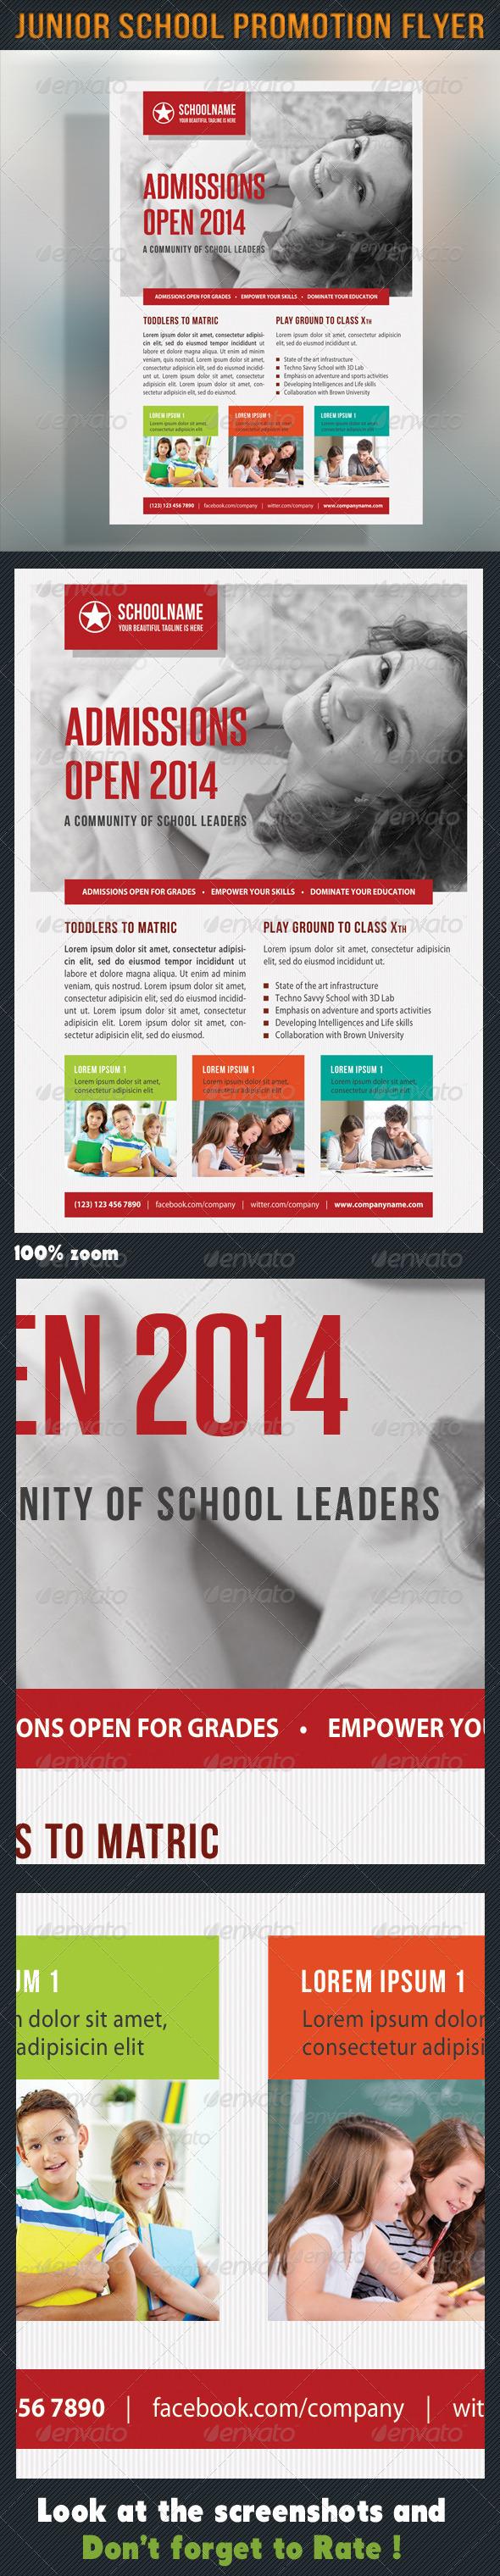 Junior School Promotion Flyer 06 - Corporate Flyers